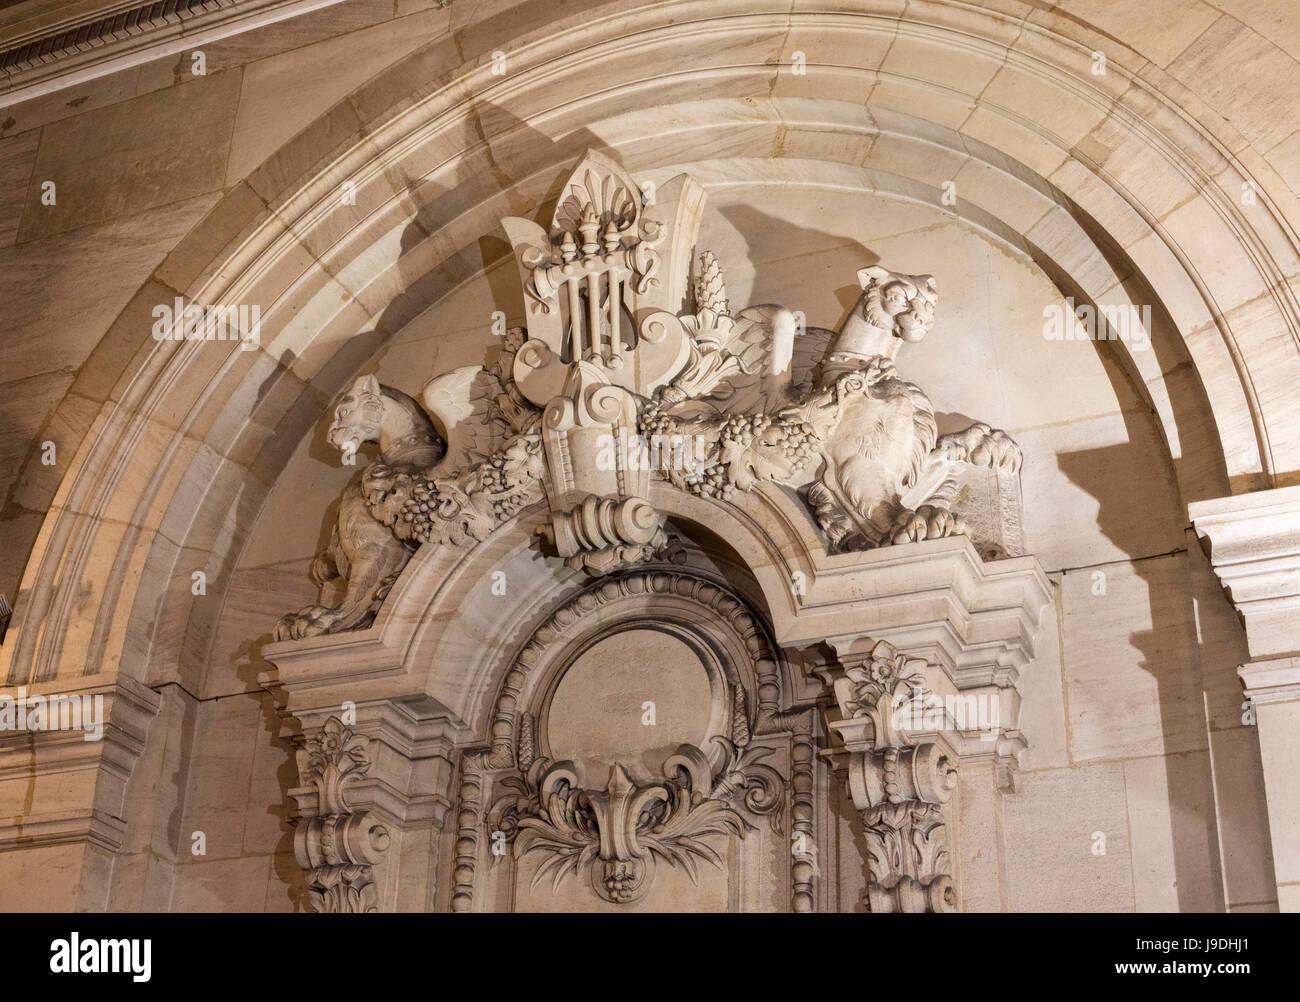 sculpture in interior, Palais Garnier Opera House, Paris, France - Stock Image